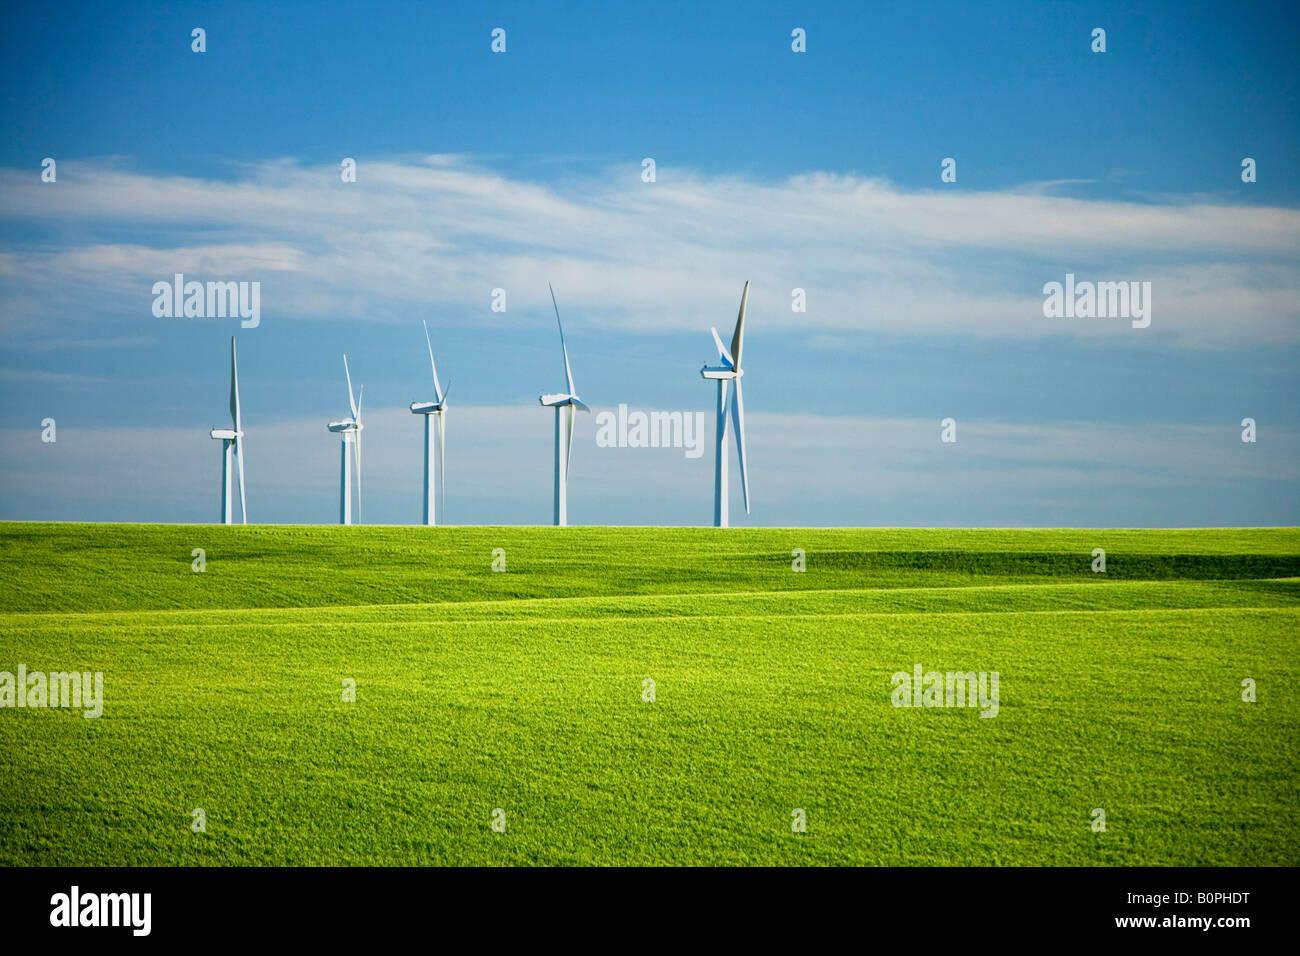 Wind Turbines in immature wheat field. - Stock Image